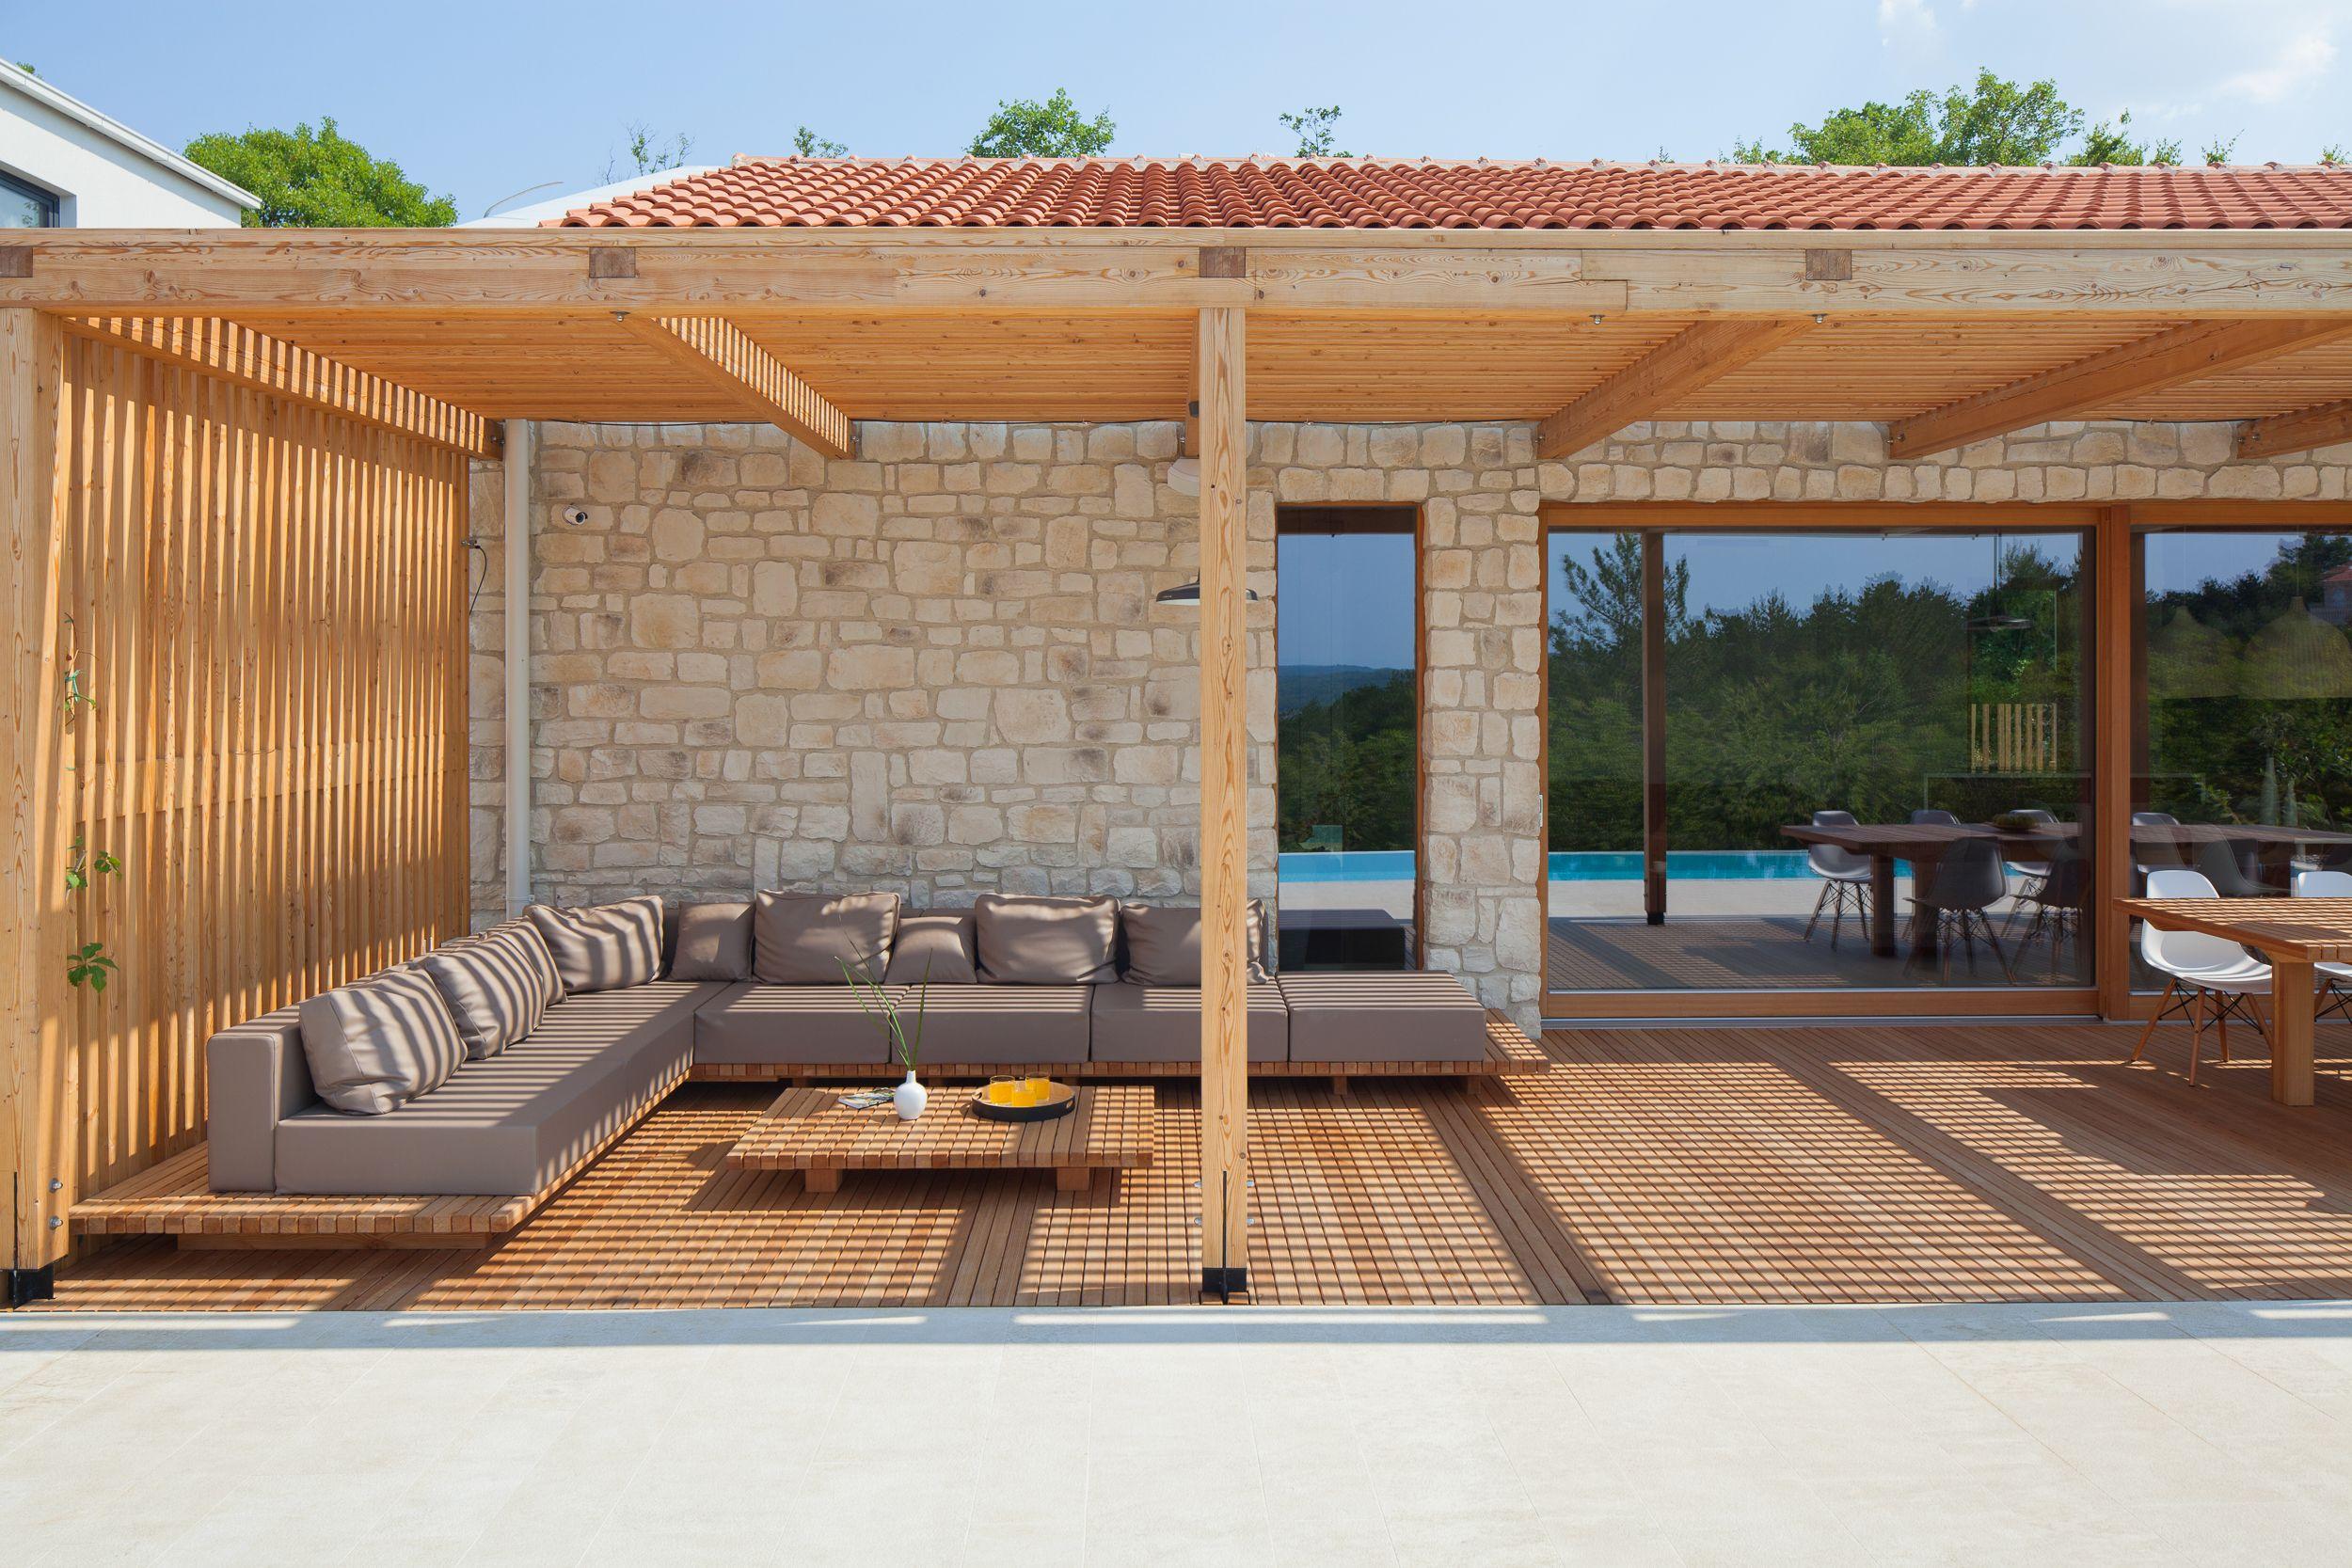 Pin by Adria Villas on Villa Olea on island Krk, Croatia